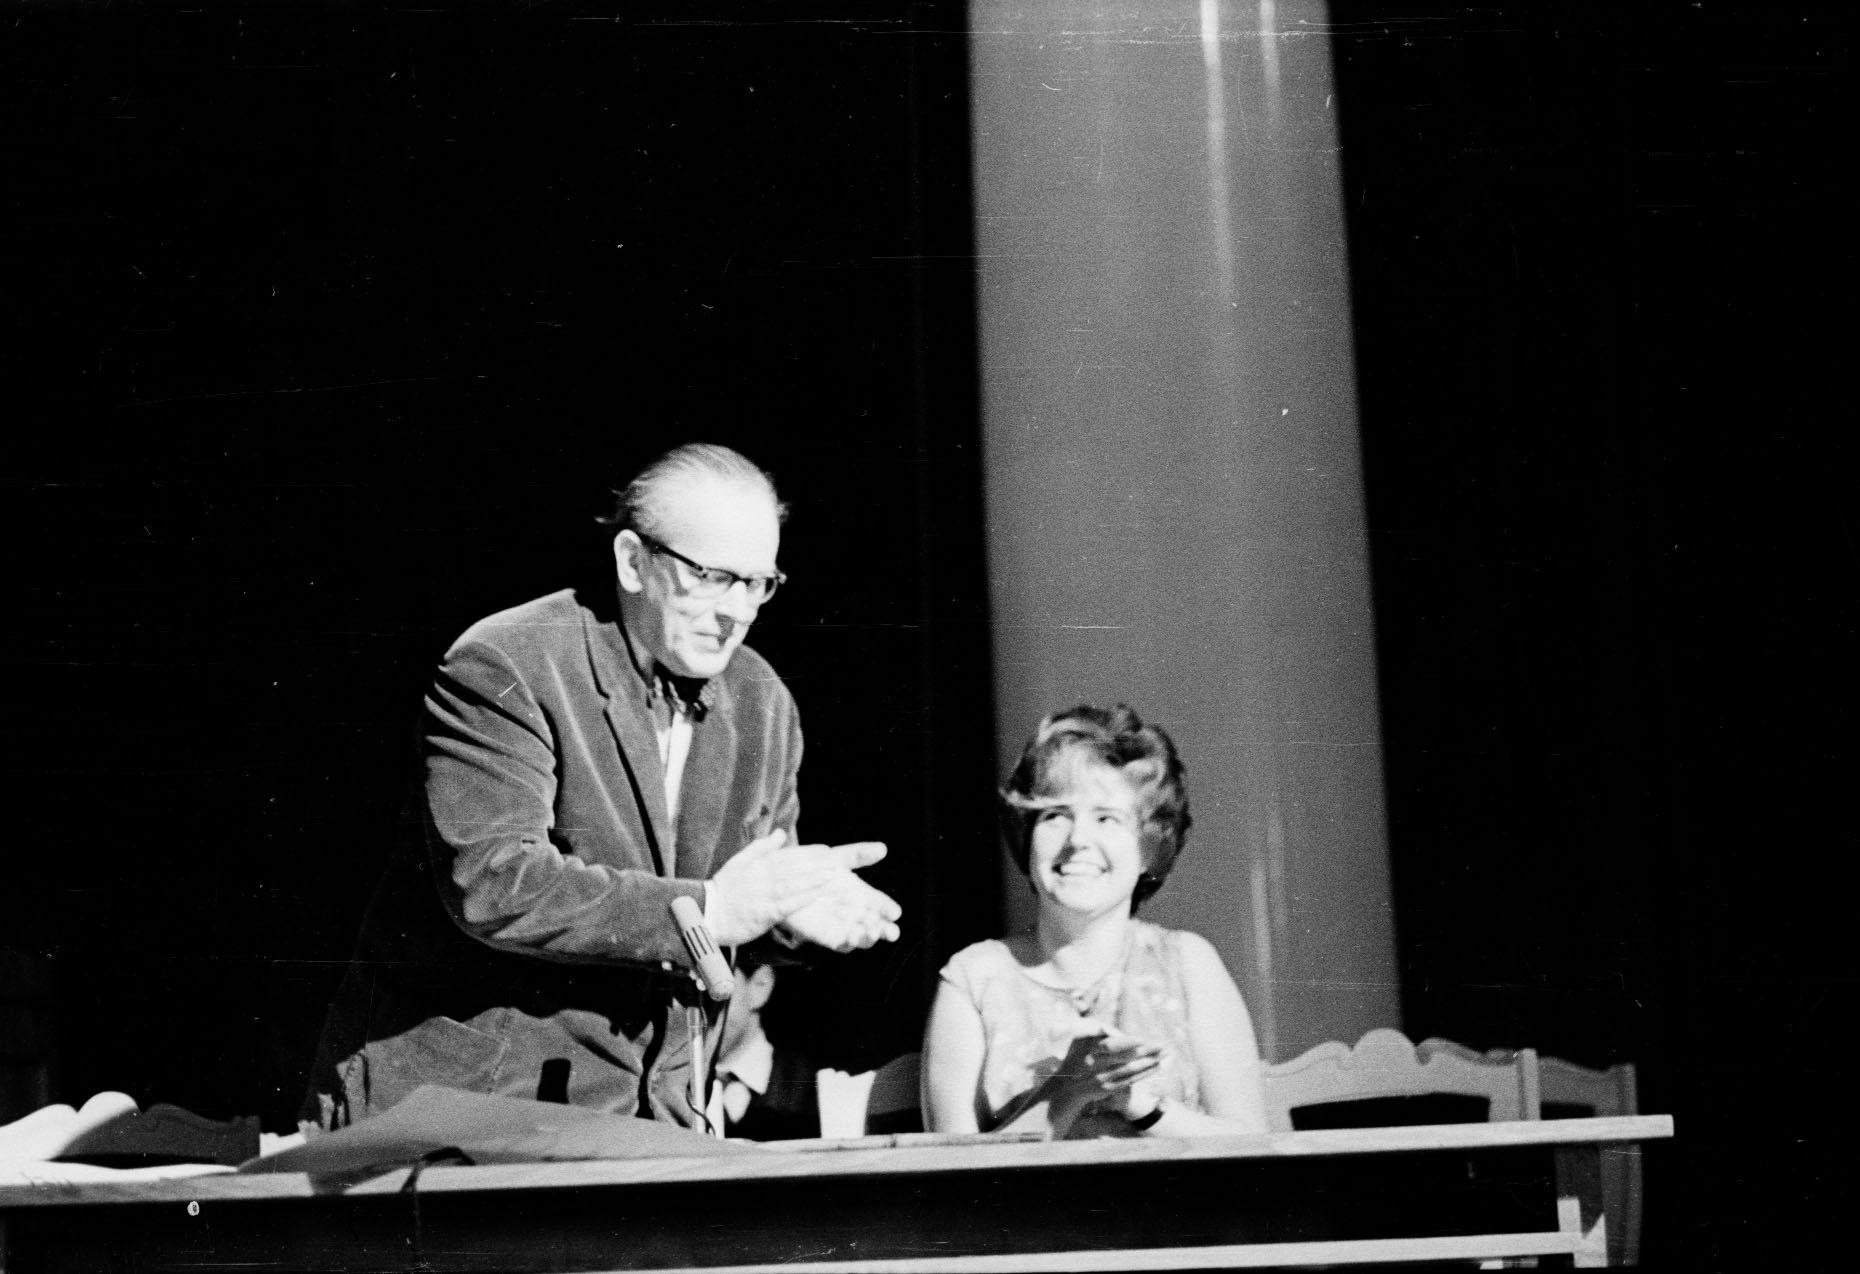 День физика на физфаке ЛГУ (1967). Н. А. и «мисс Физика» (Анечка Кузнецова).